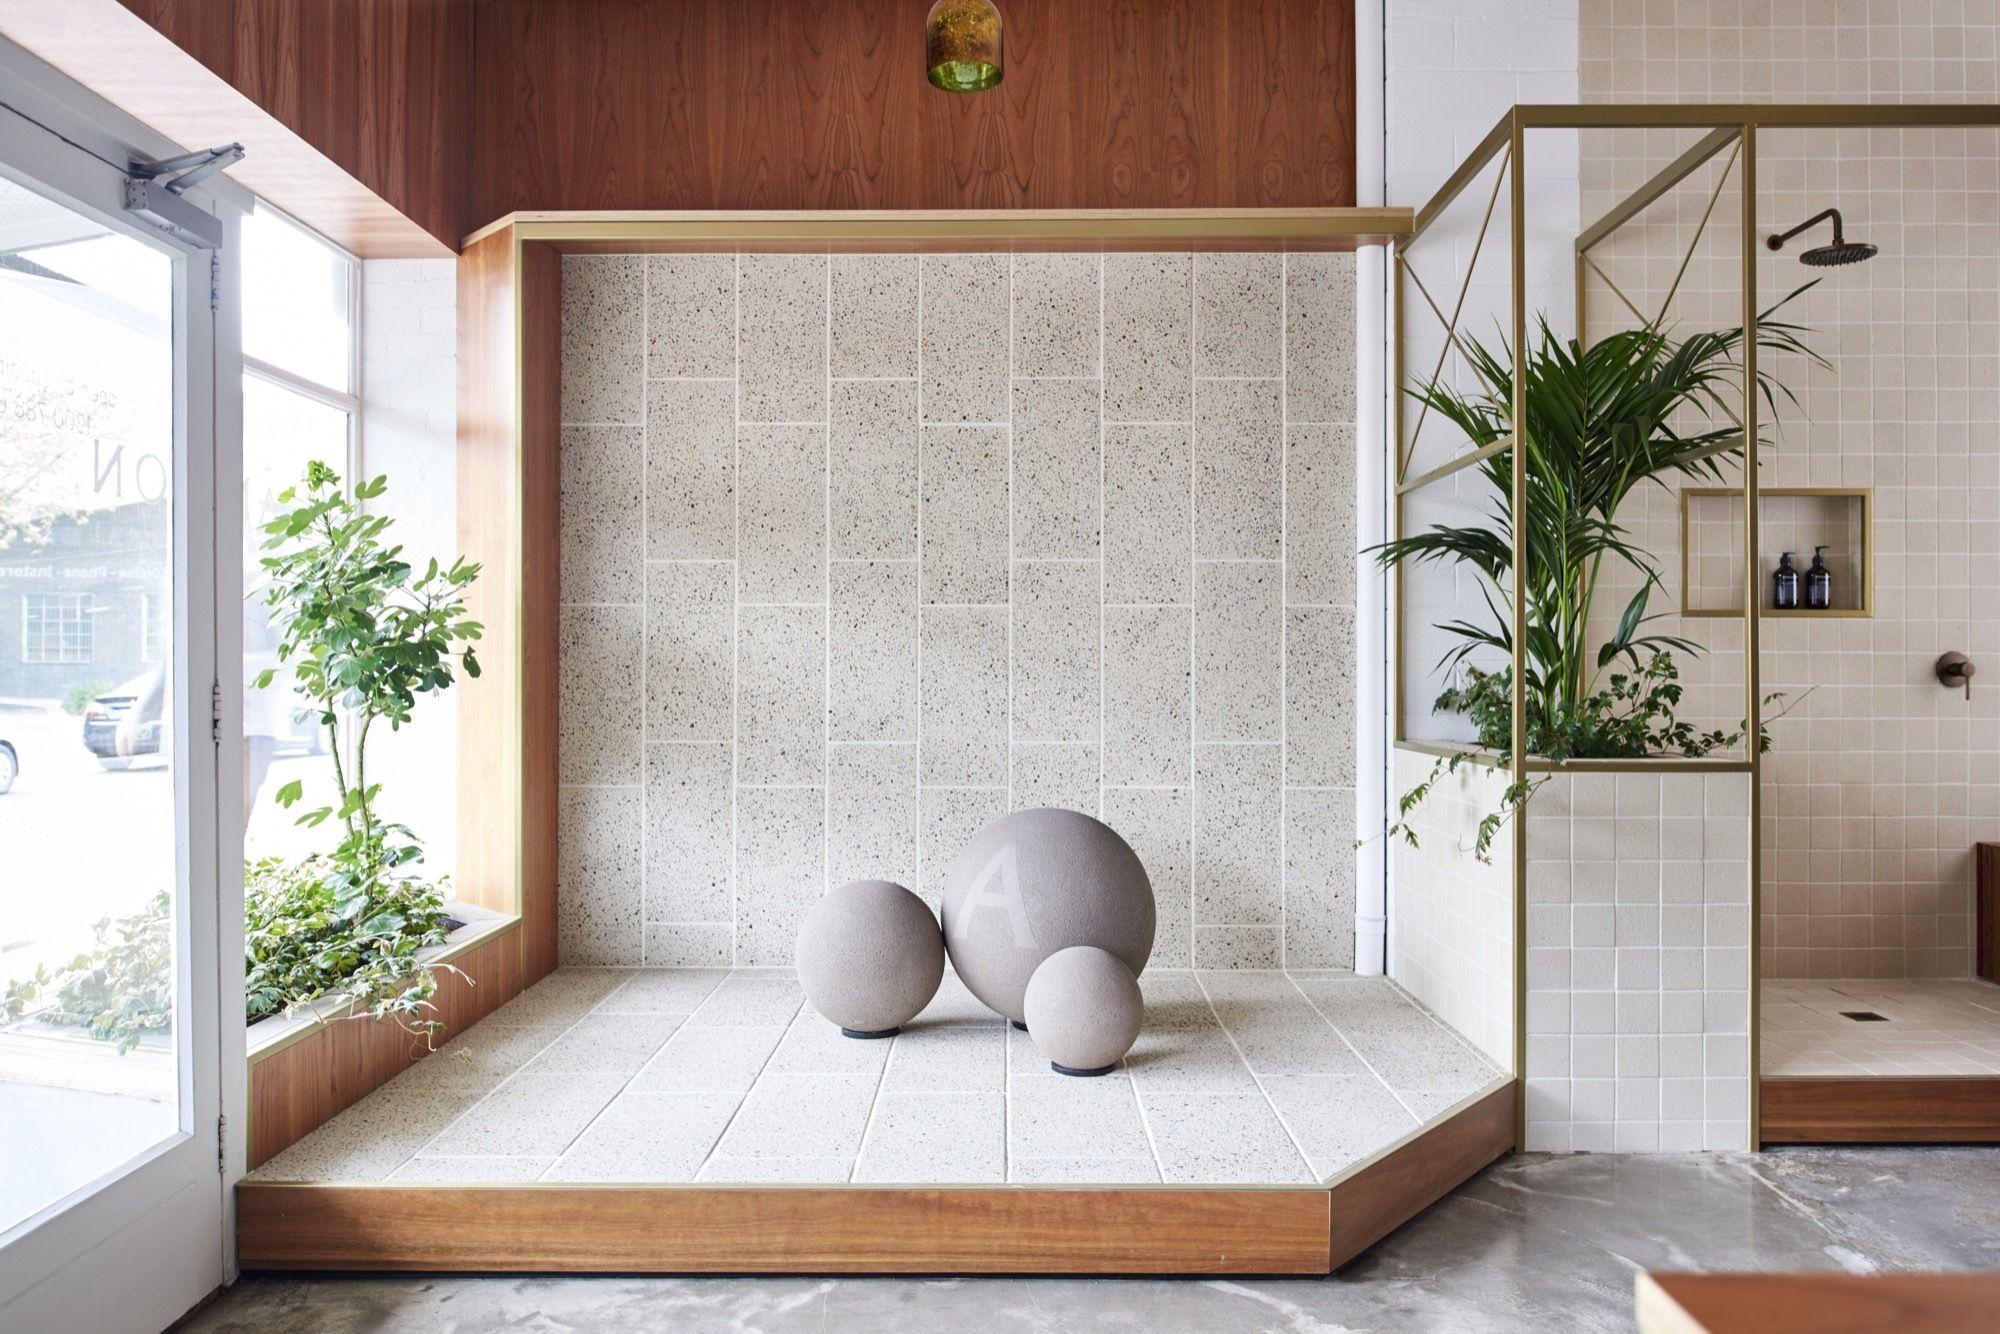 Anston Architectural Dan Gayfer Design Commercial Interior